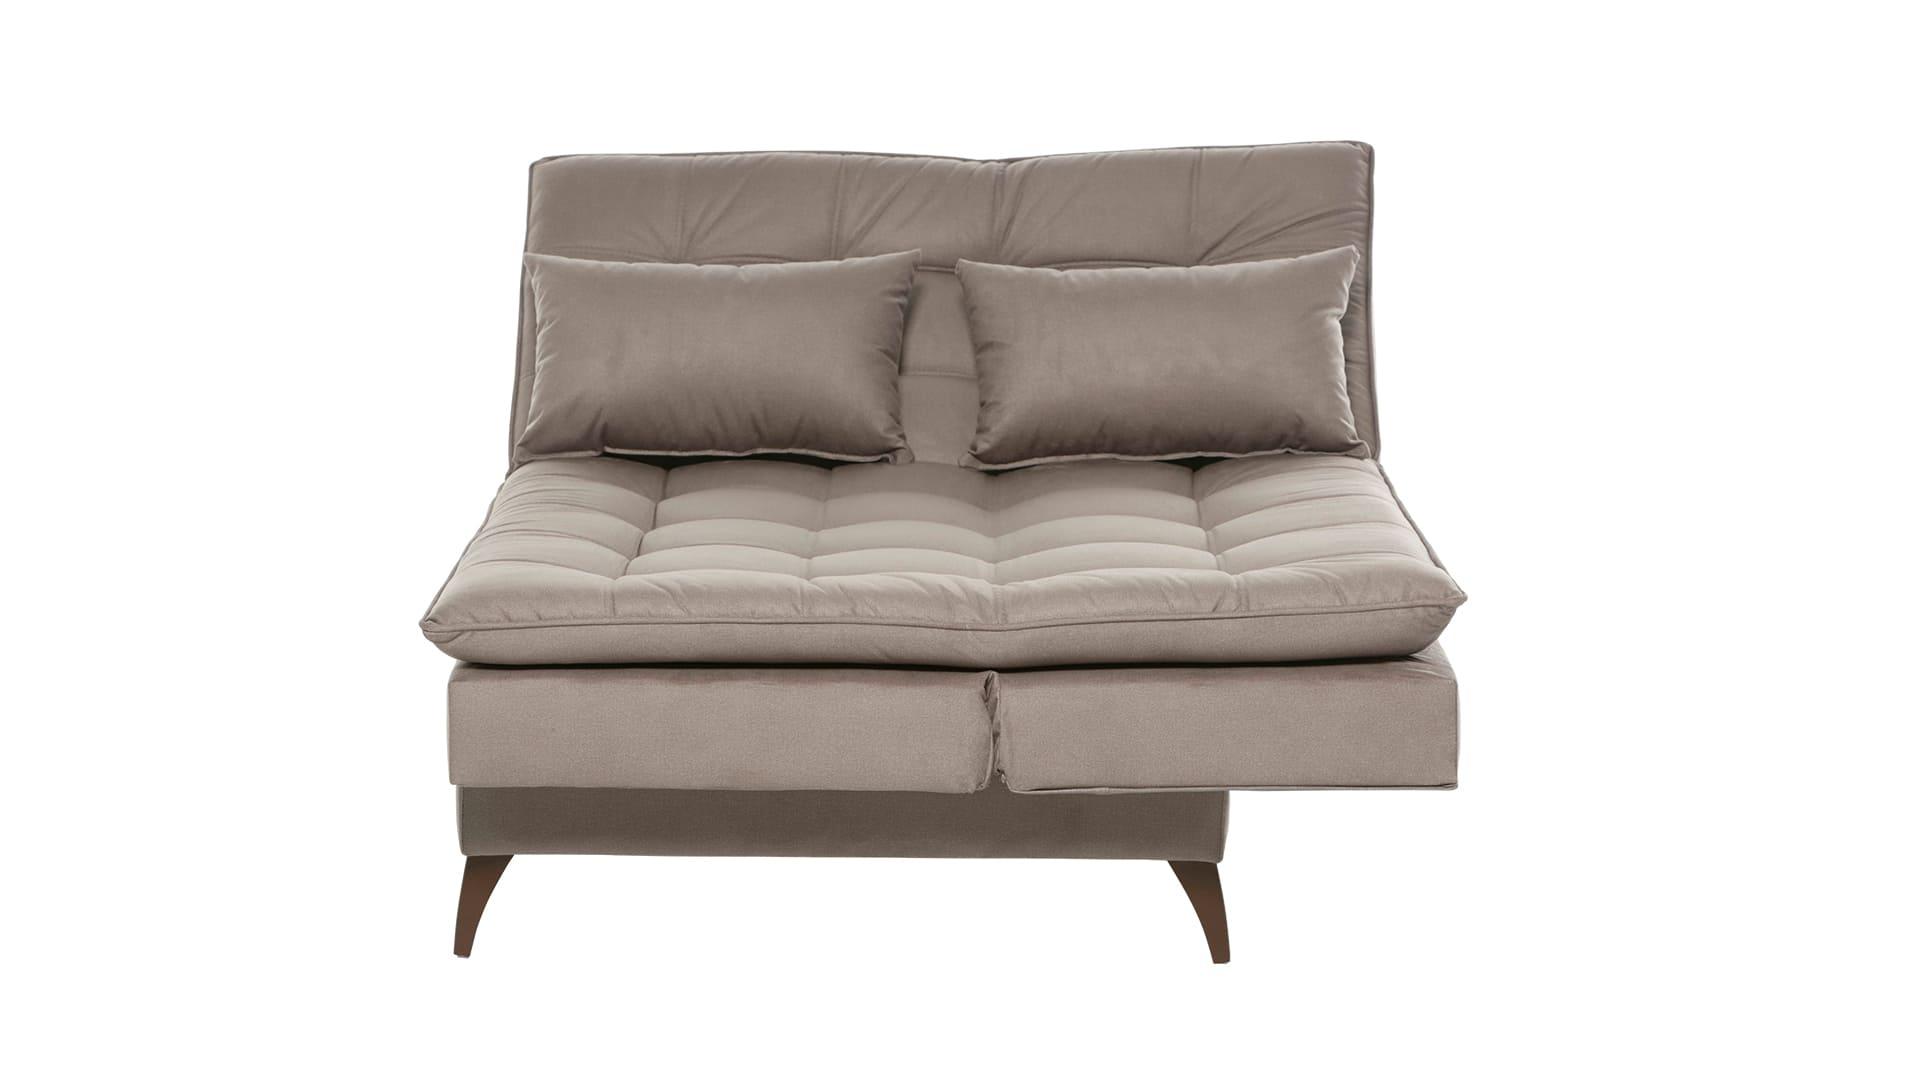 Sofá Cama Casal 3 Lugares com Chaise 190 cm Premium Creme